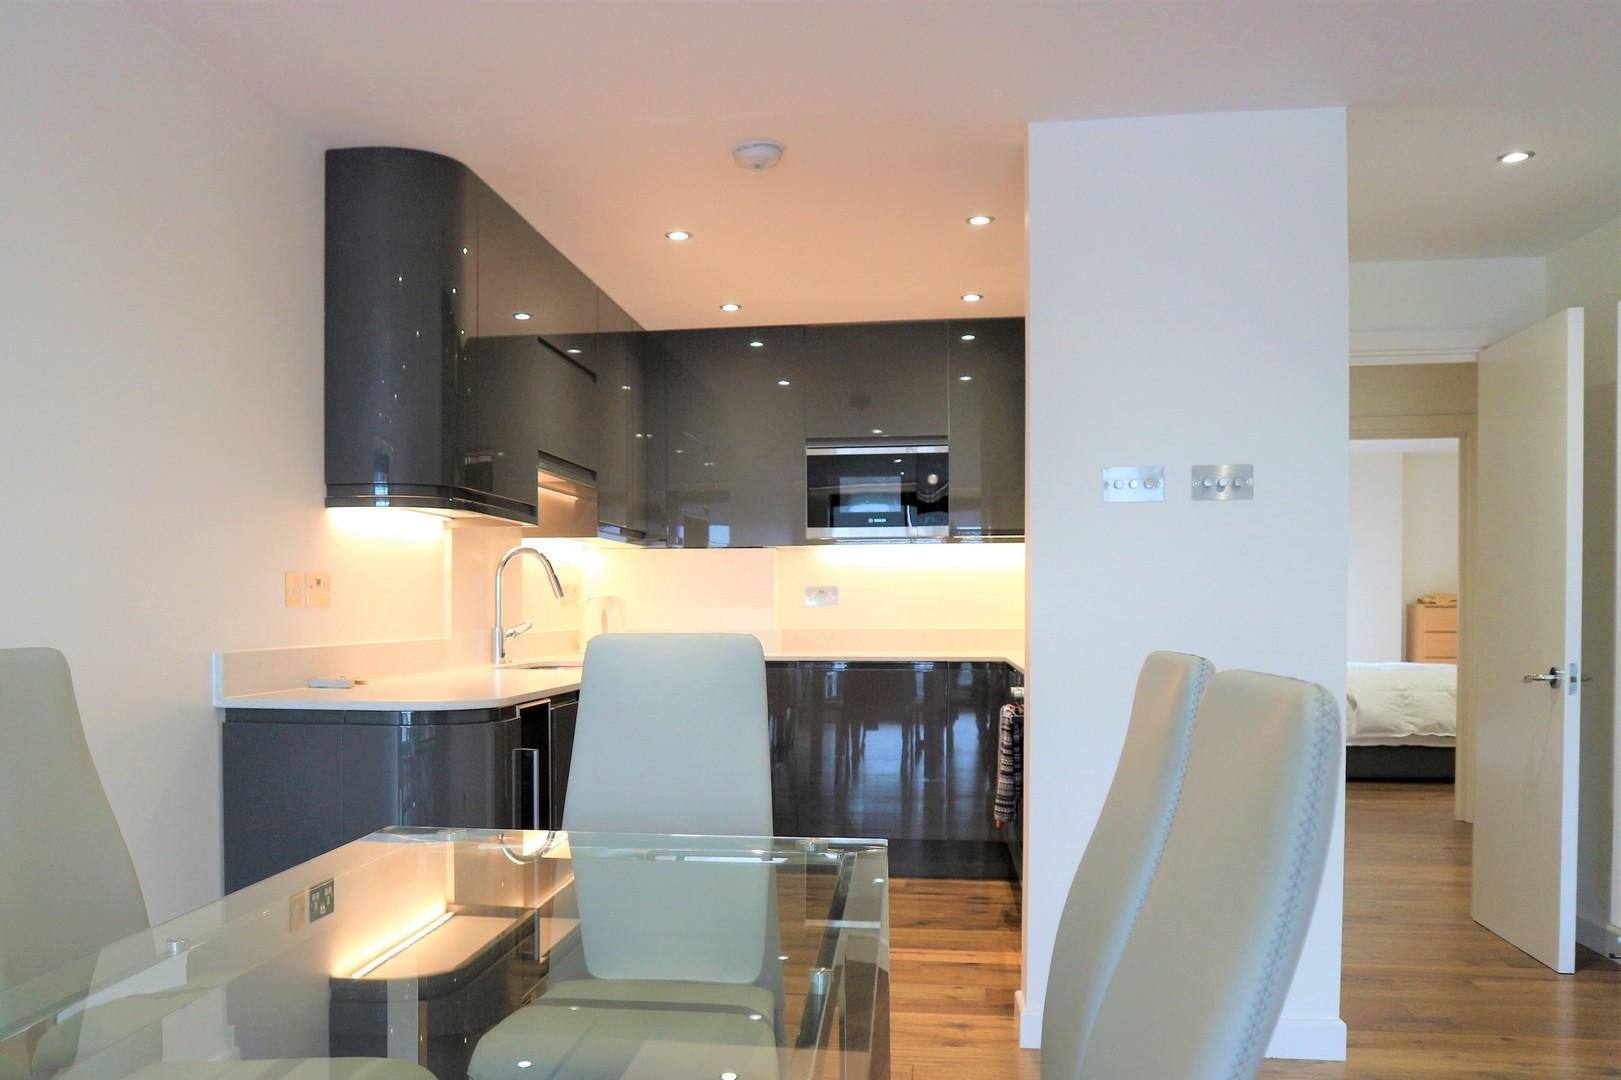 A London docklands flat refurbishment